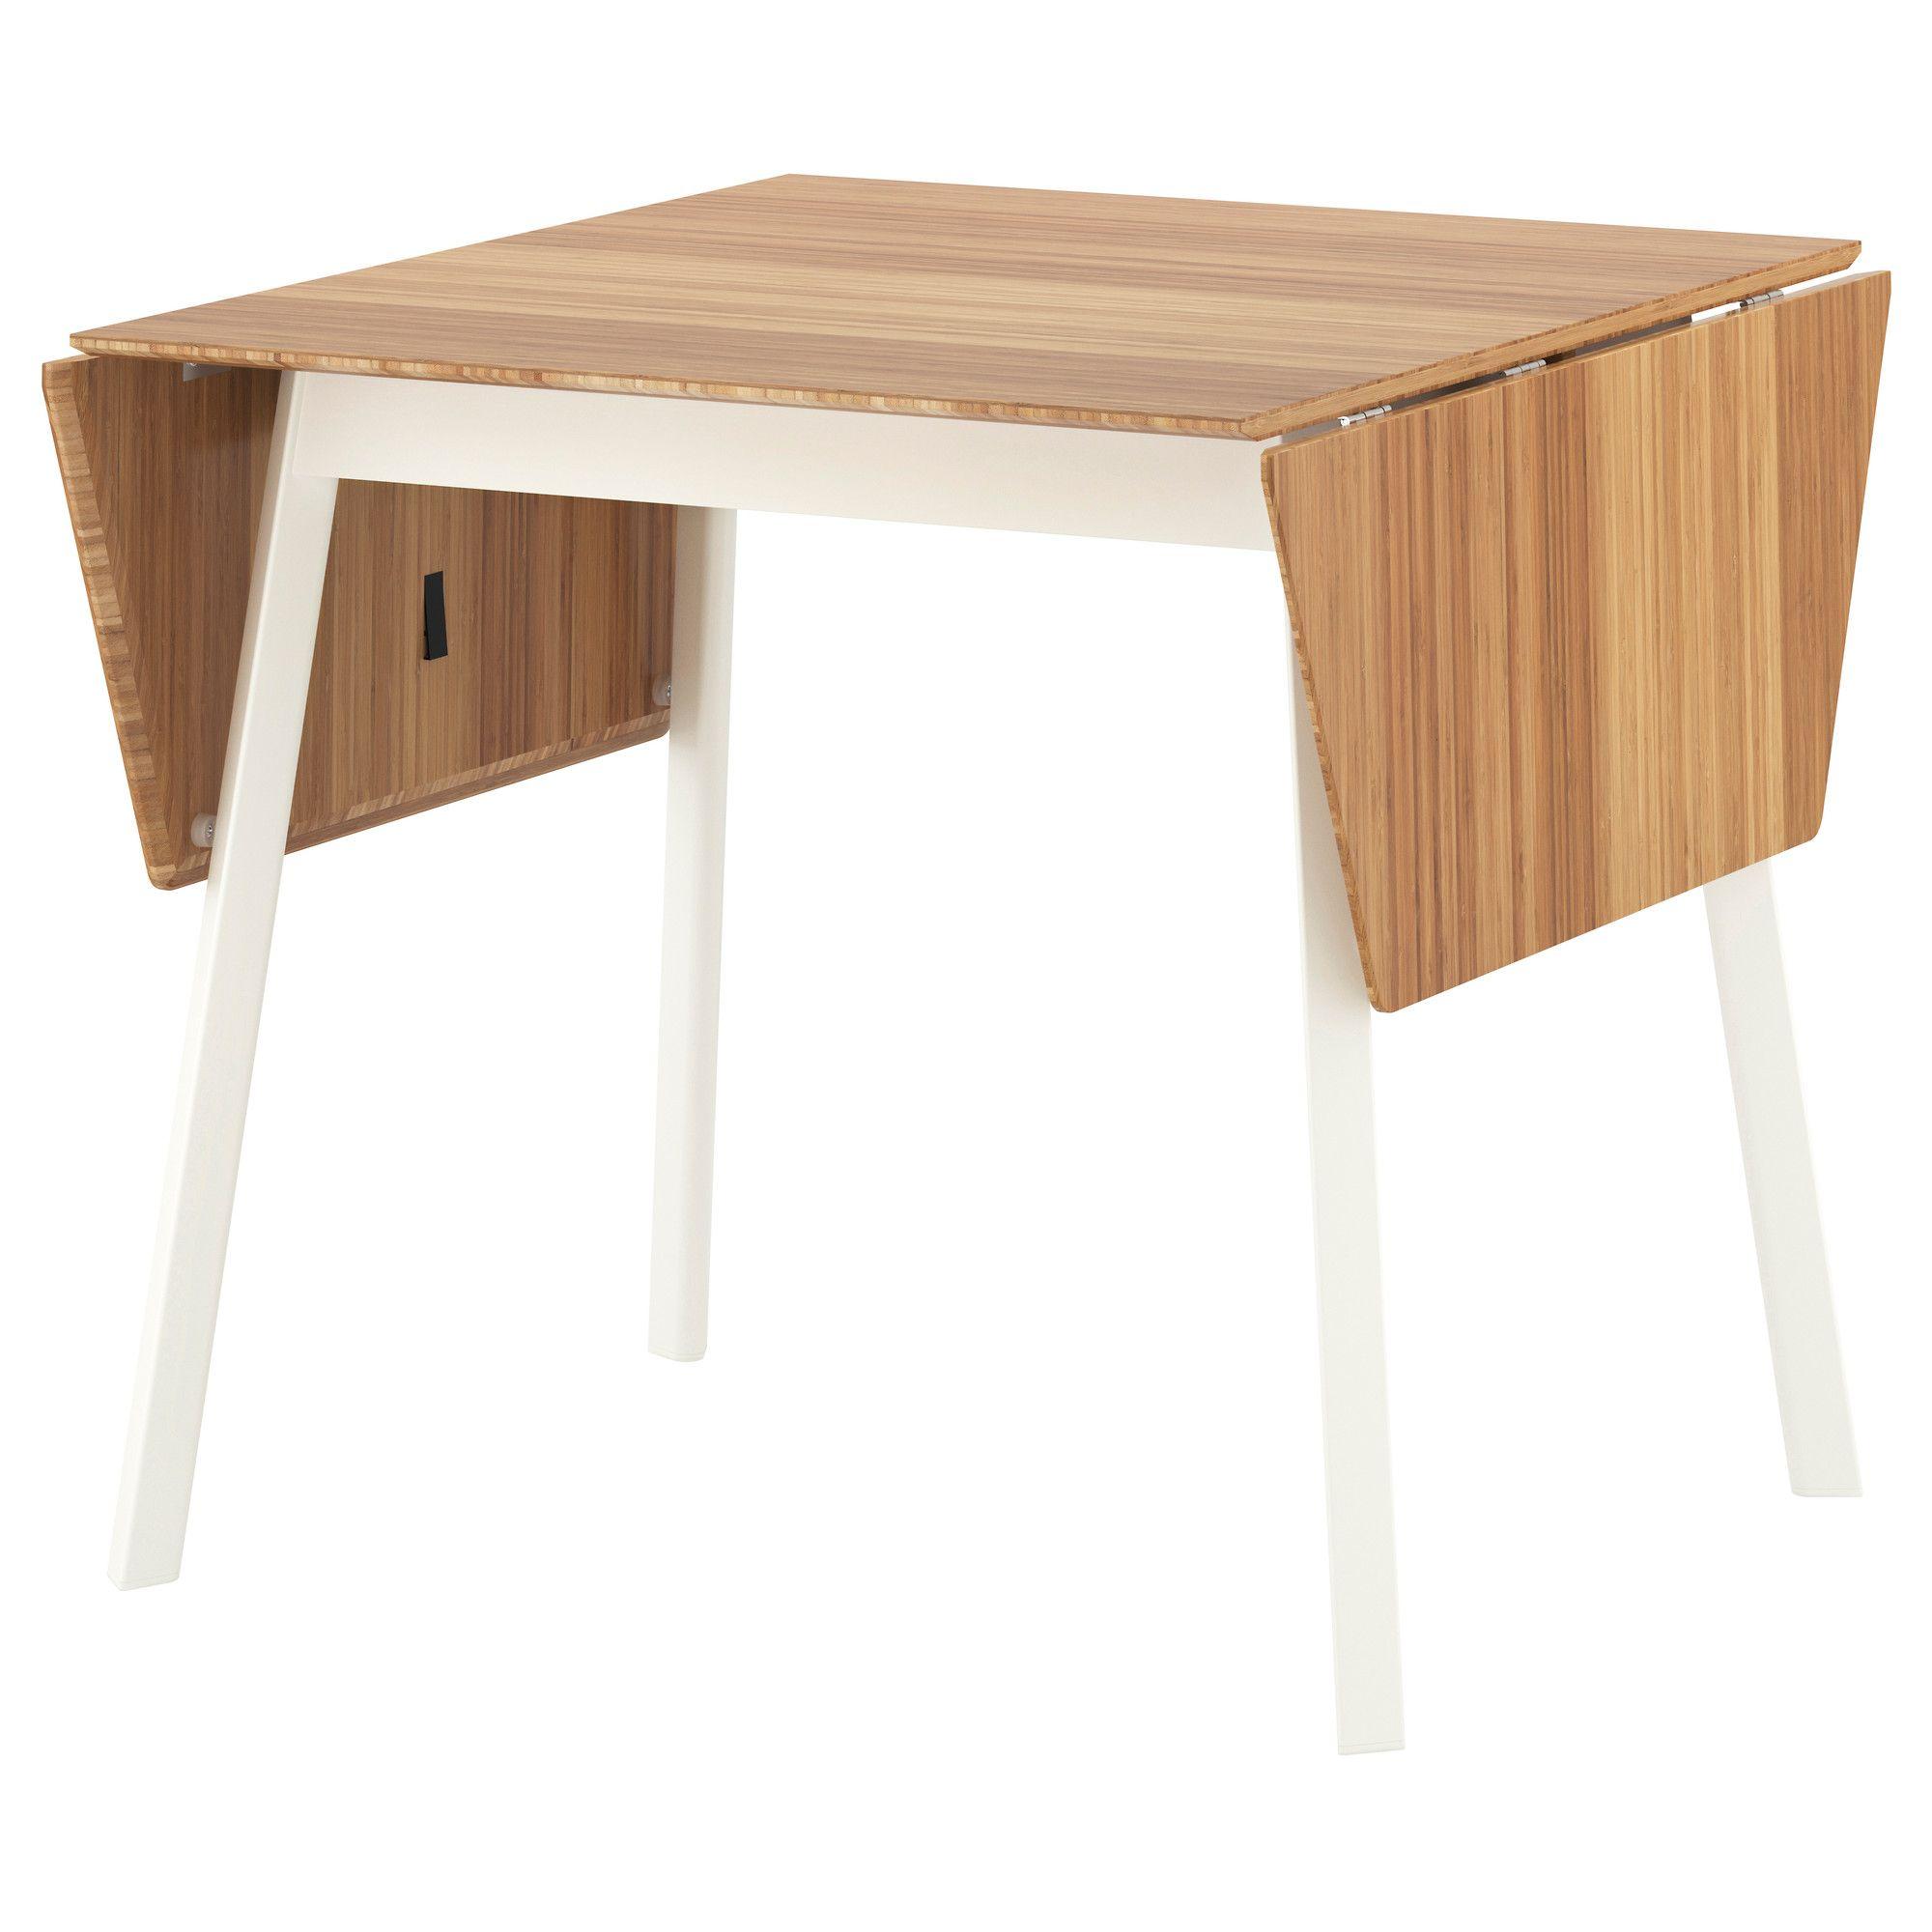 IKEA PS 2012 Mesa de hojas abatibles, bambú, blanco | Ikea ps ...